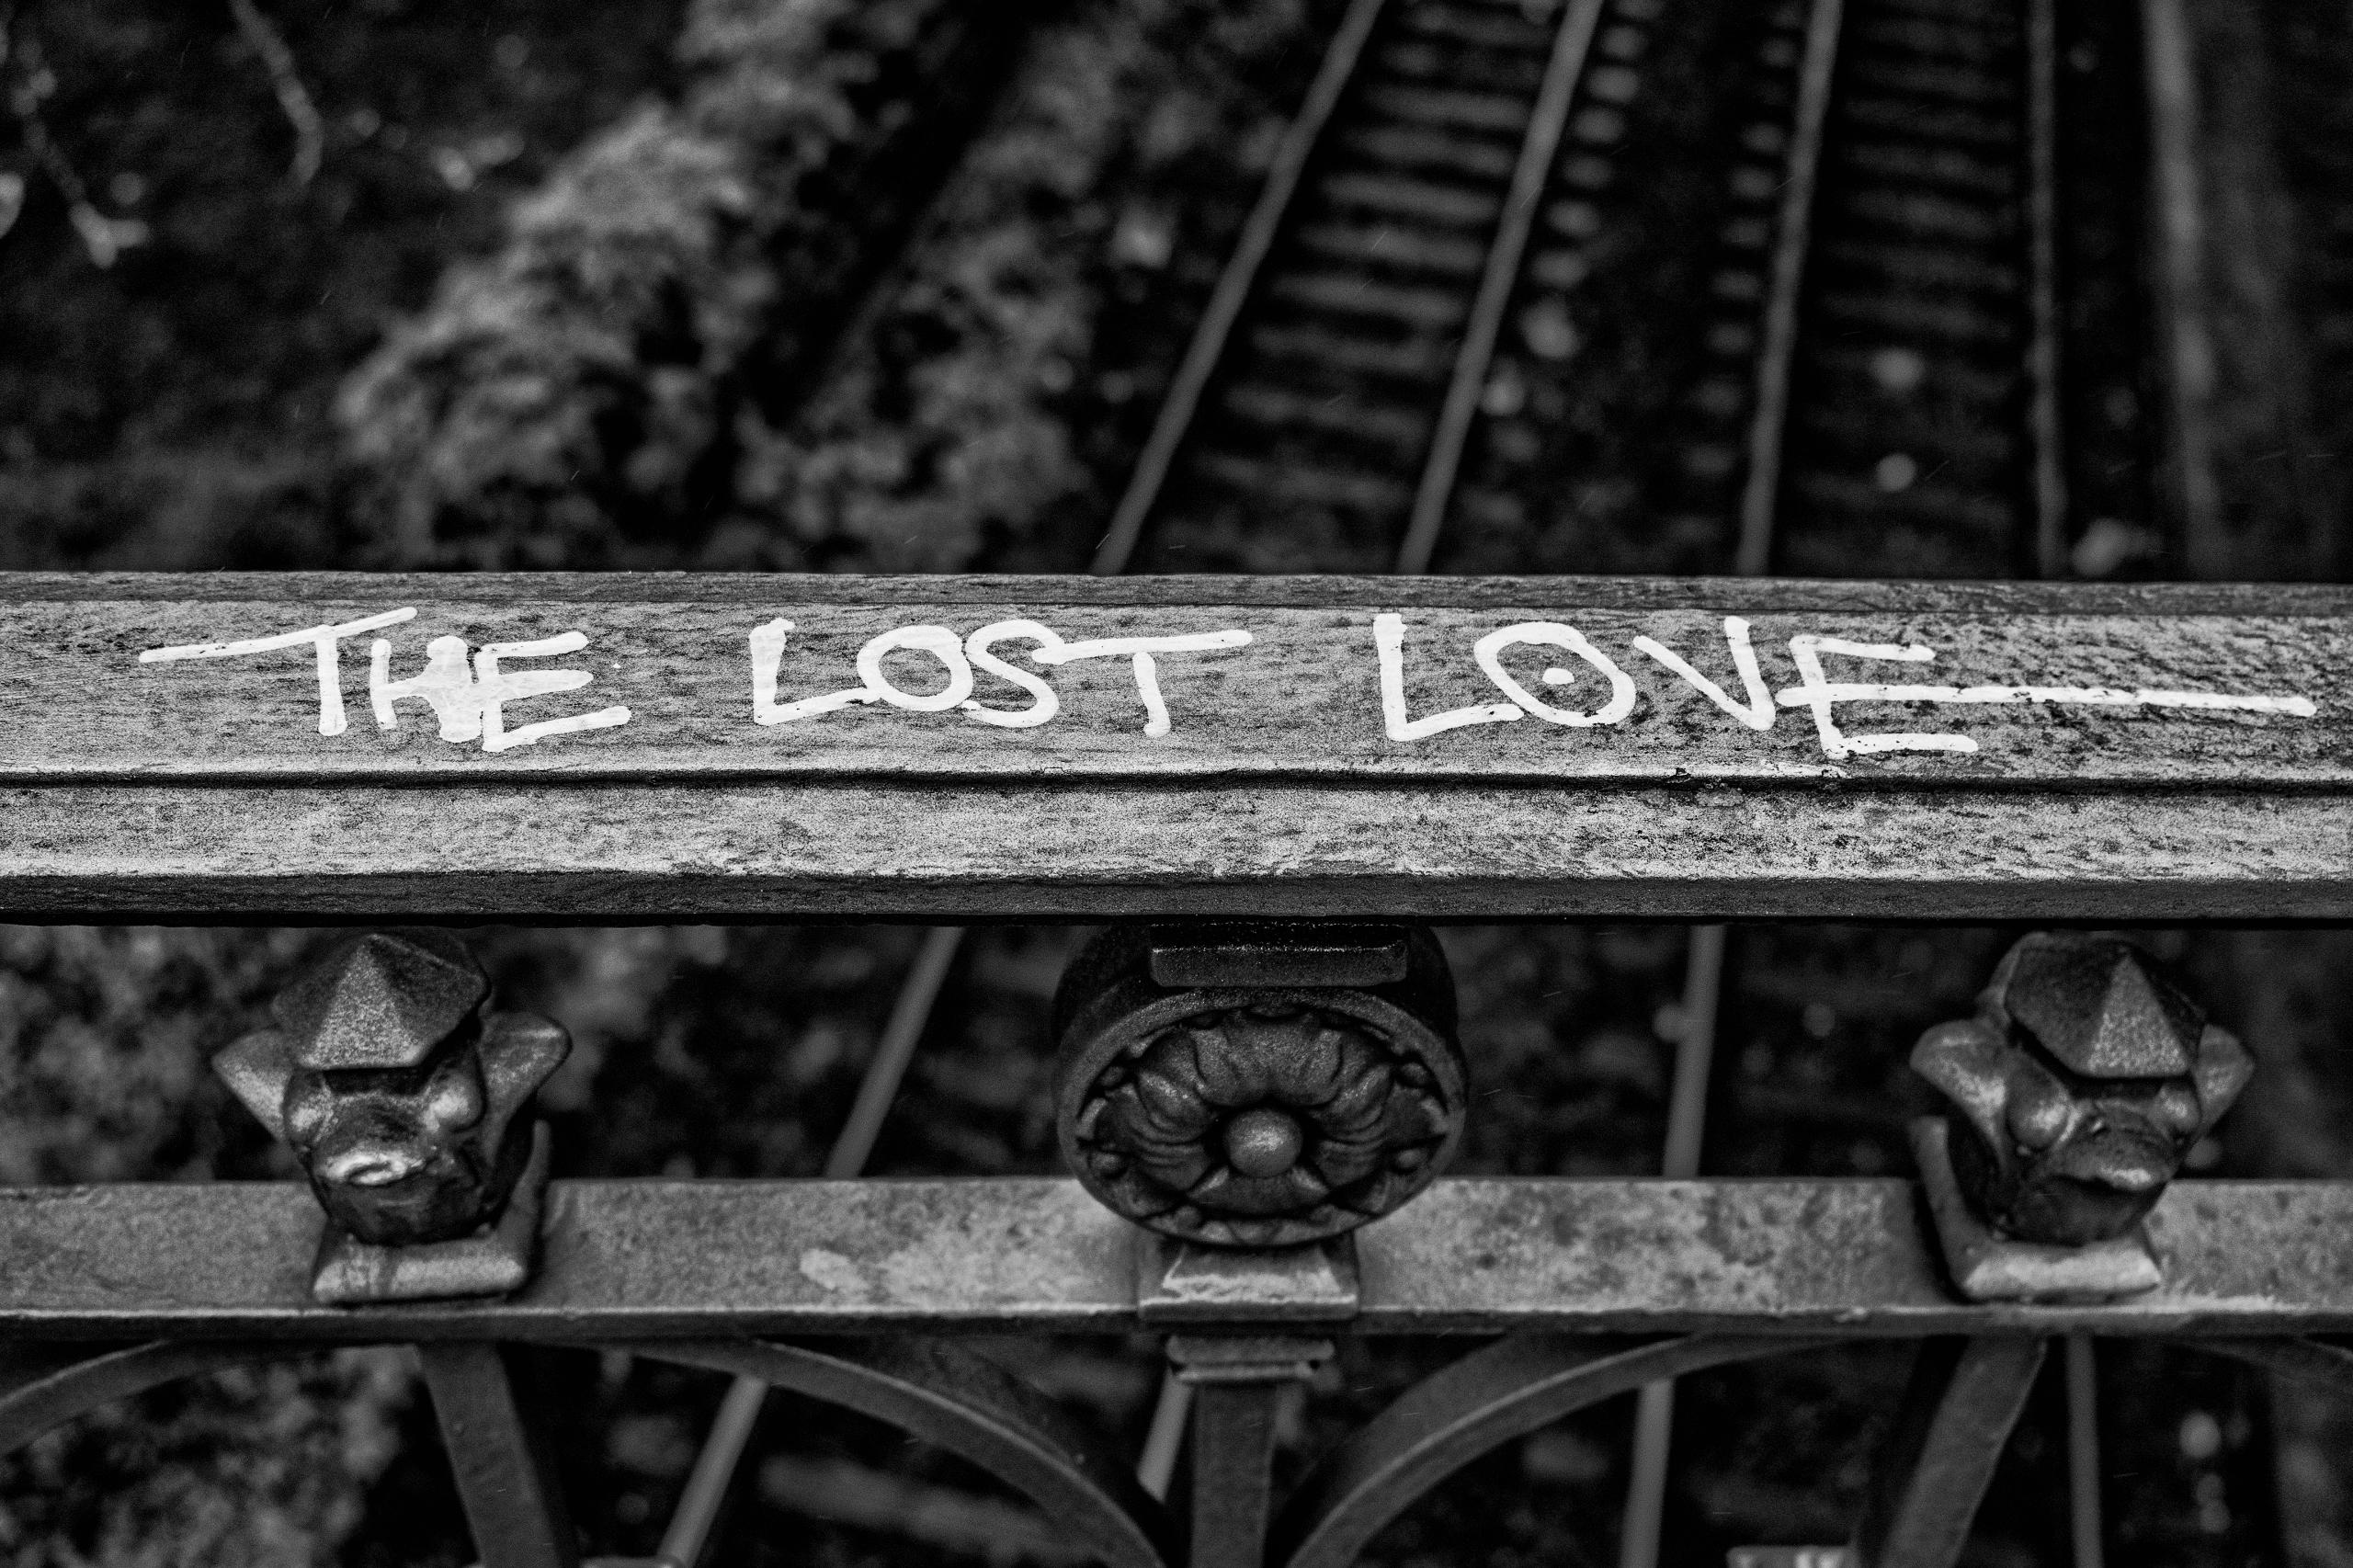 LOOKDOWN BRIDGE LOST LOVE - photography - hjsphoto | ello